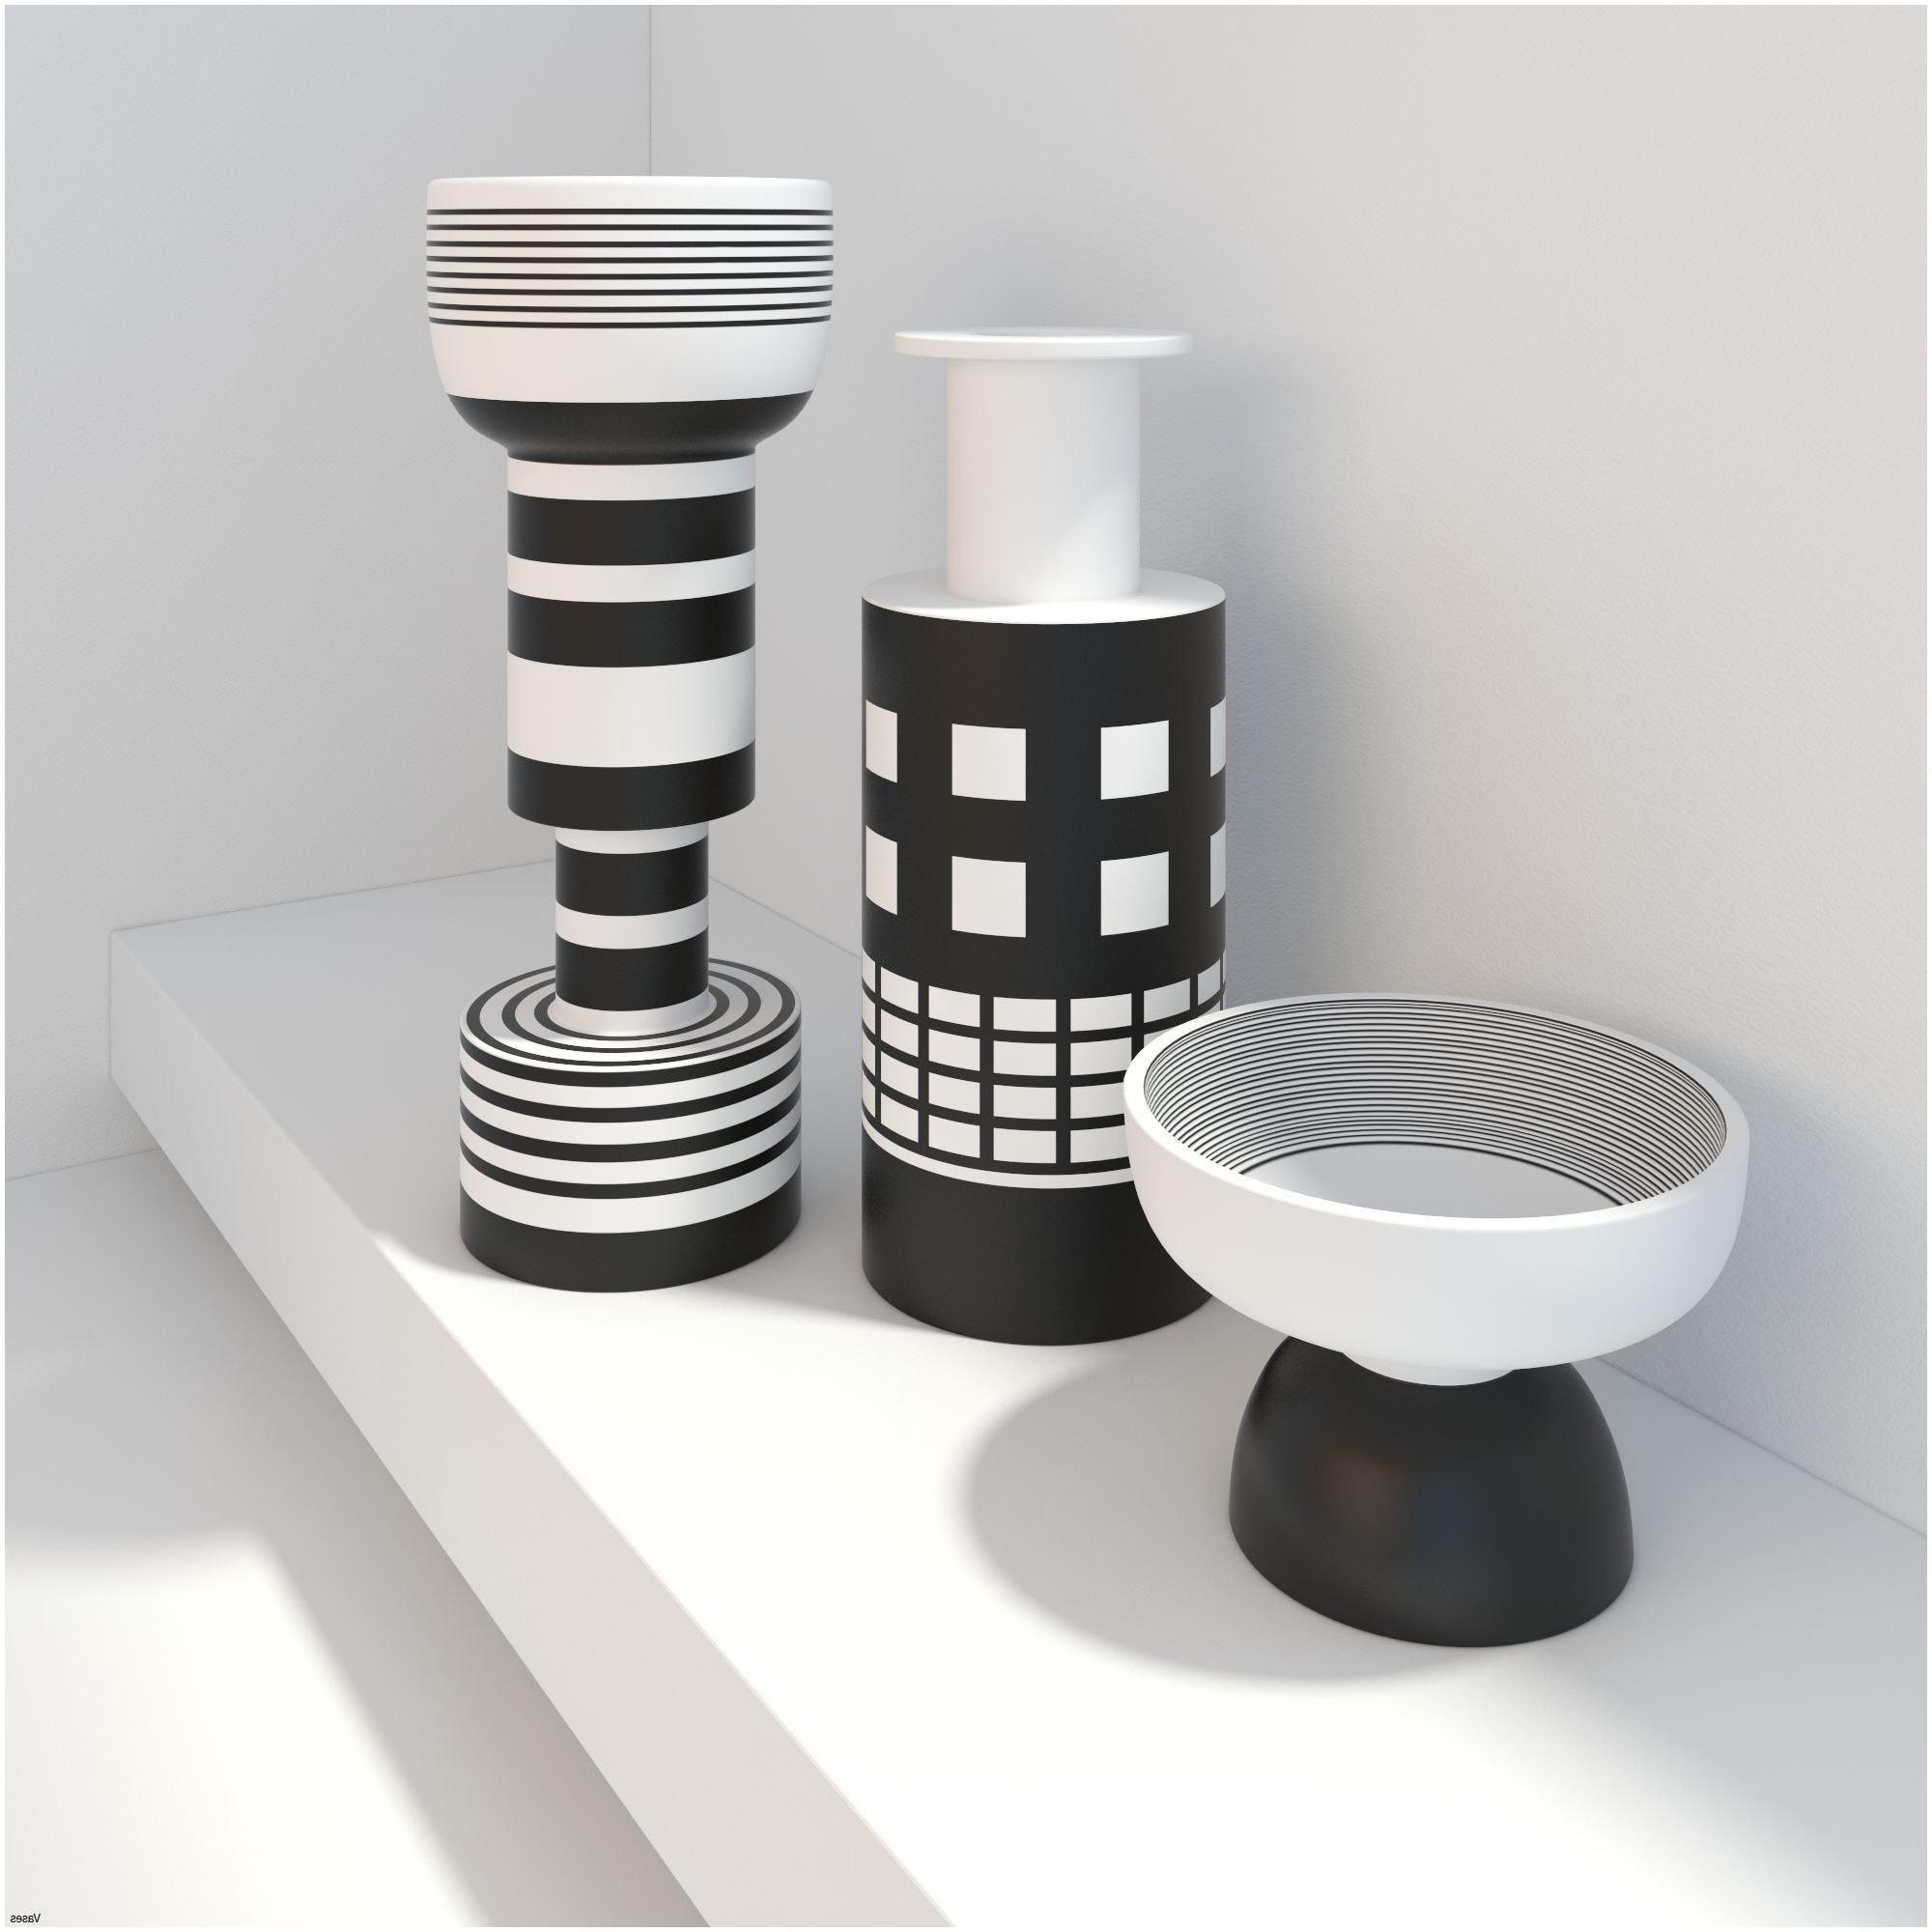 tall white vases sale of 11luxe decor 3d anciendemutu org pertaining to bitossi modern vases black and white decor 3d model max obj fbxh fbx mtl i 0d